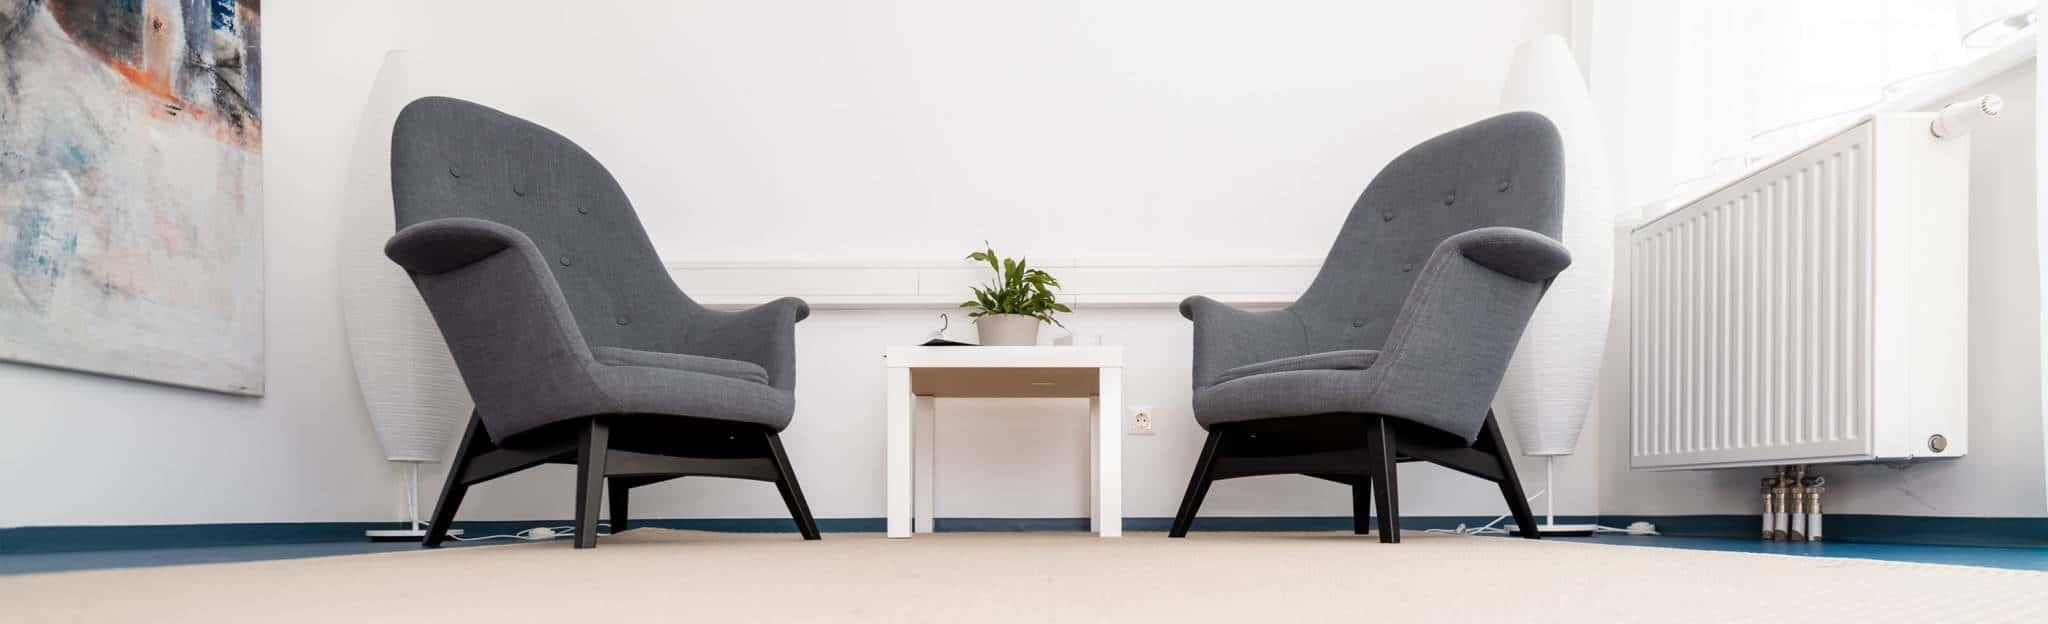 Sessel in einer Praxis